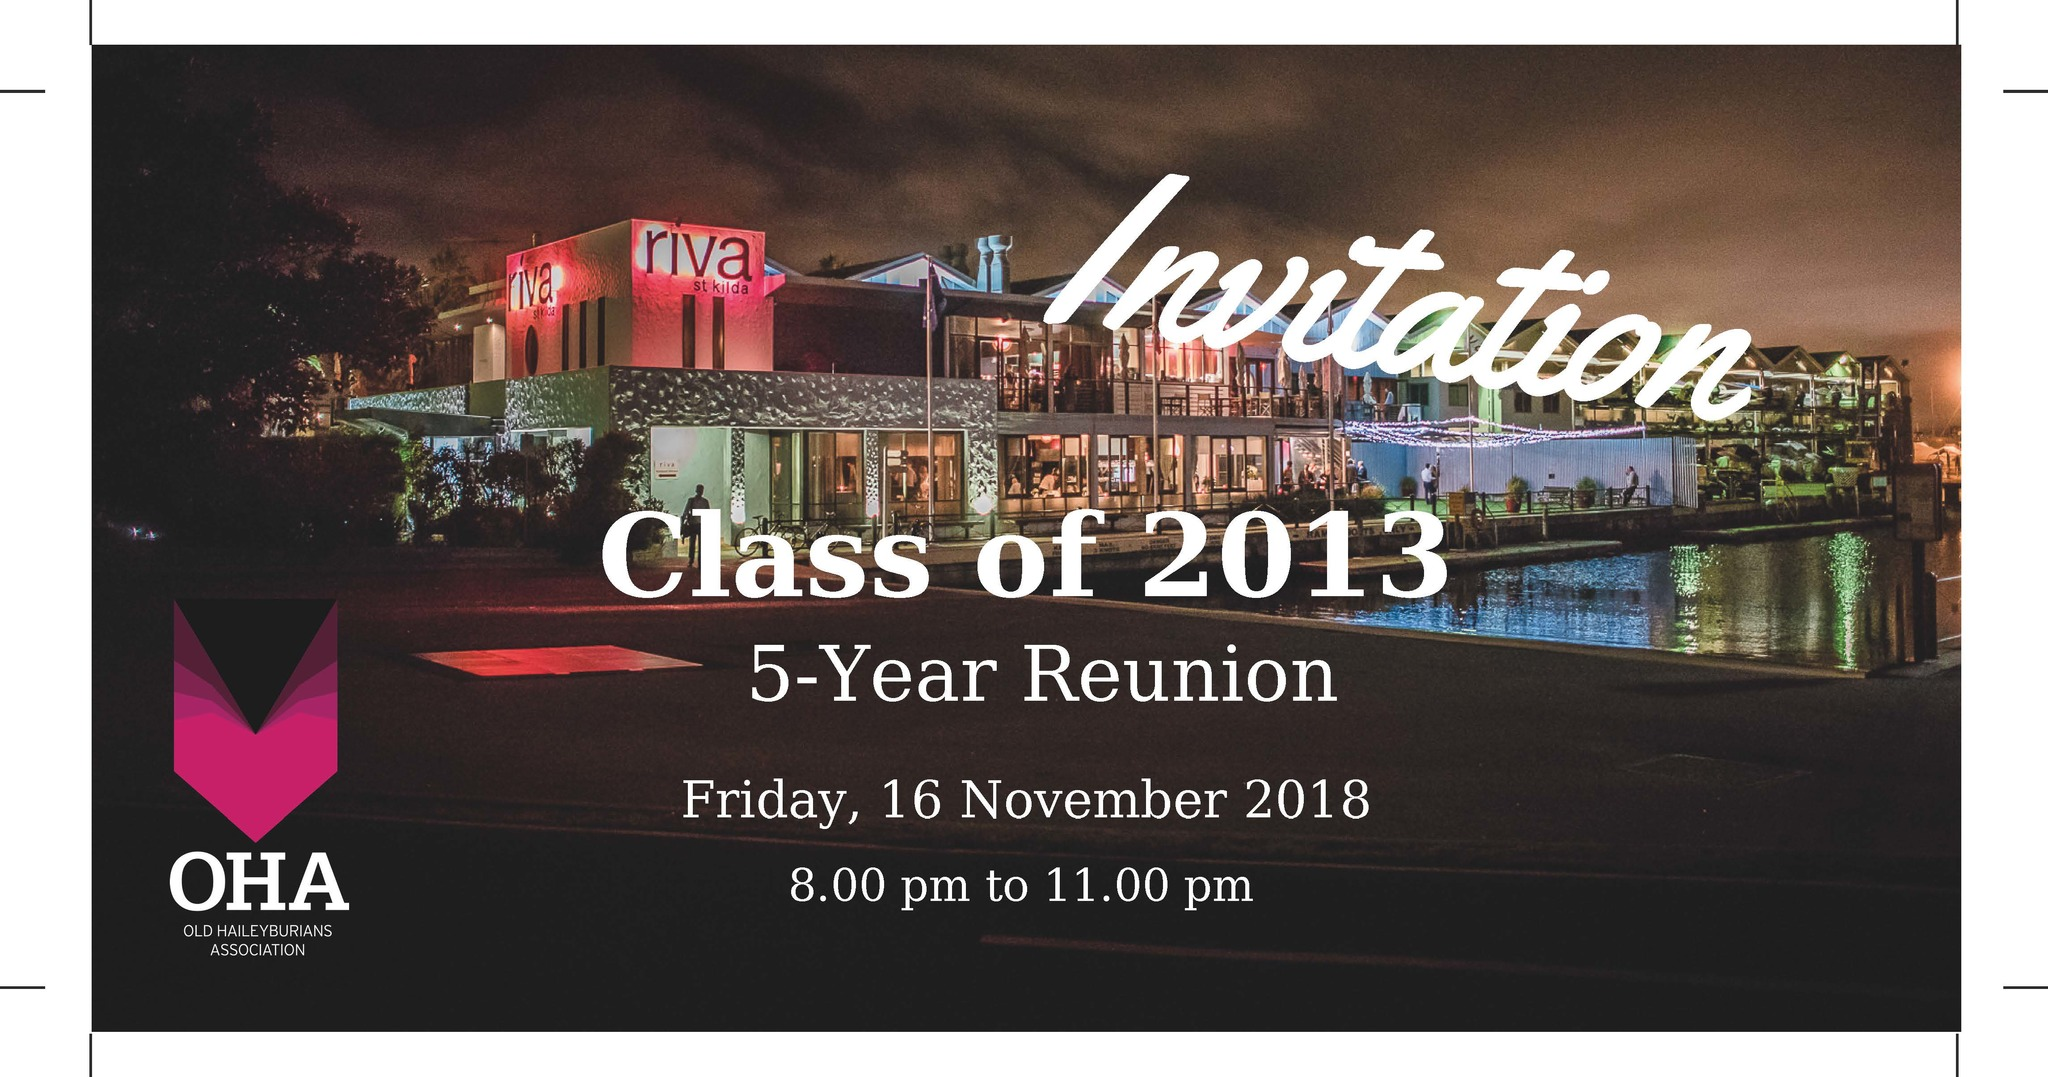 Class of 2013 - 5 Year Reunion